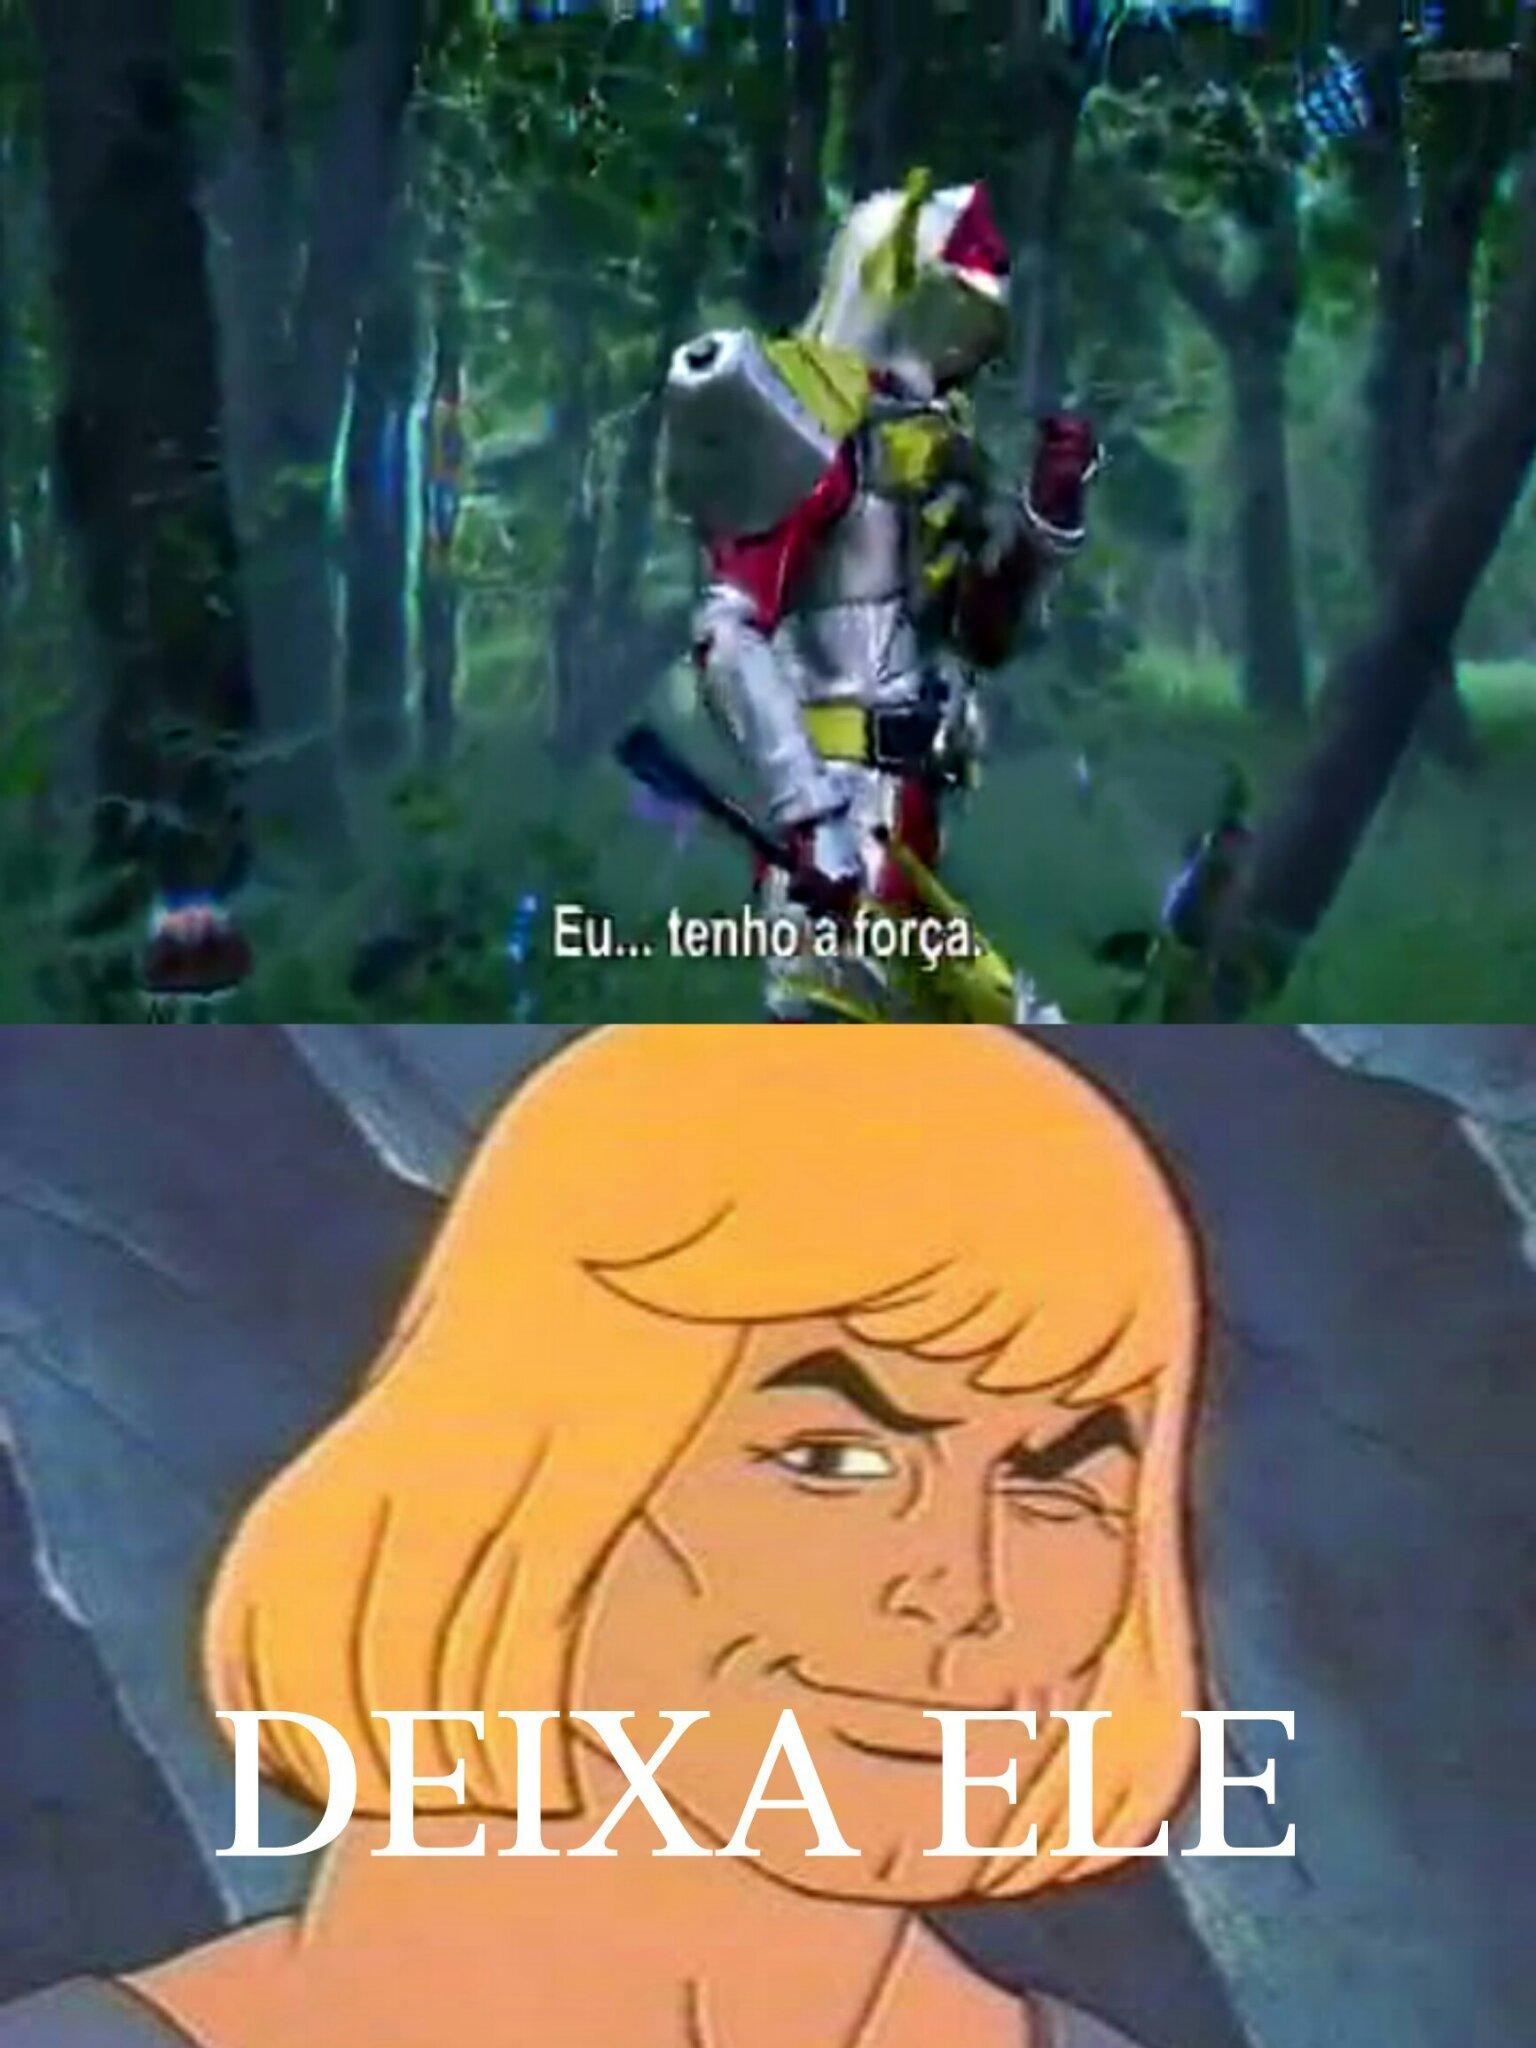 He Man zuero - meme